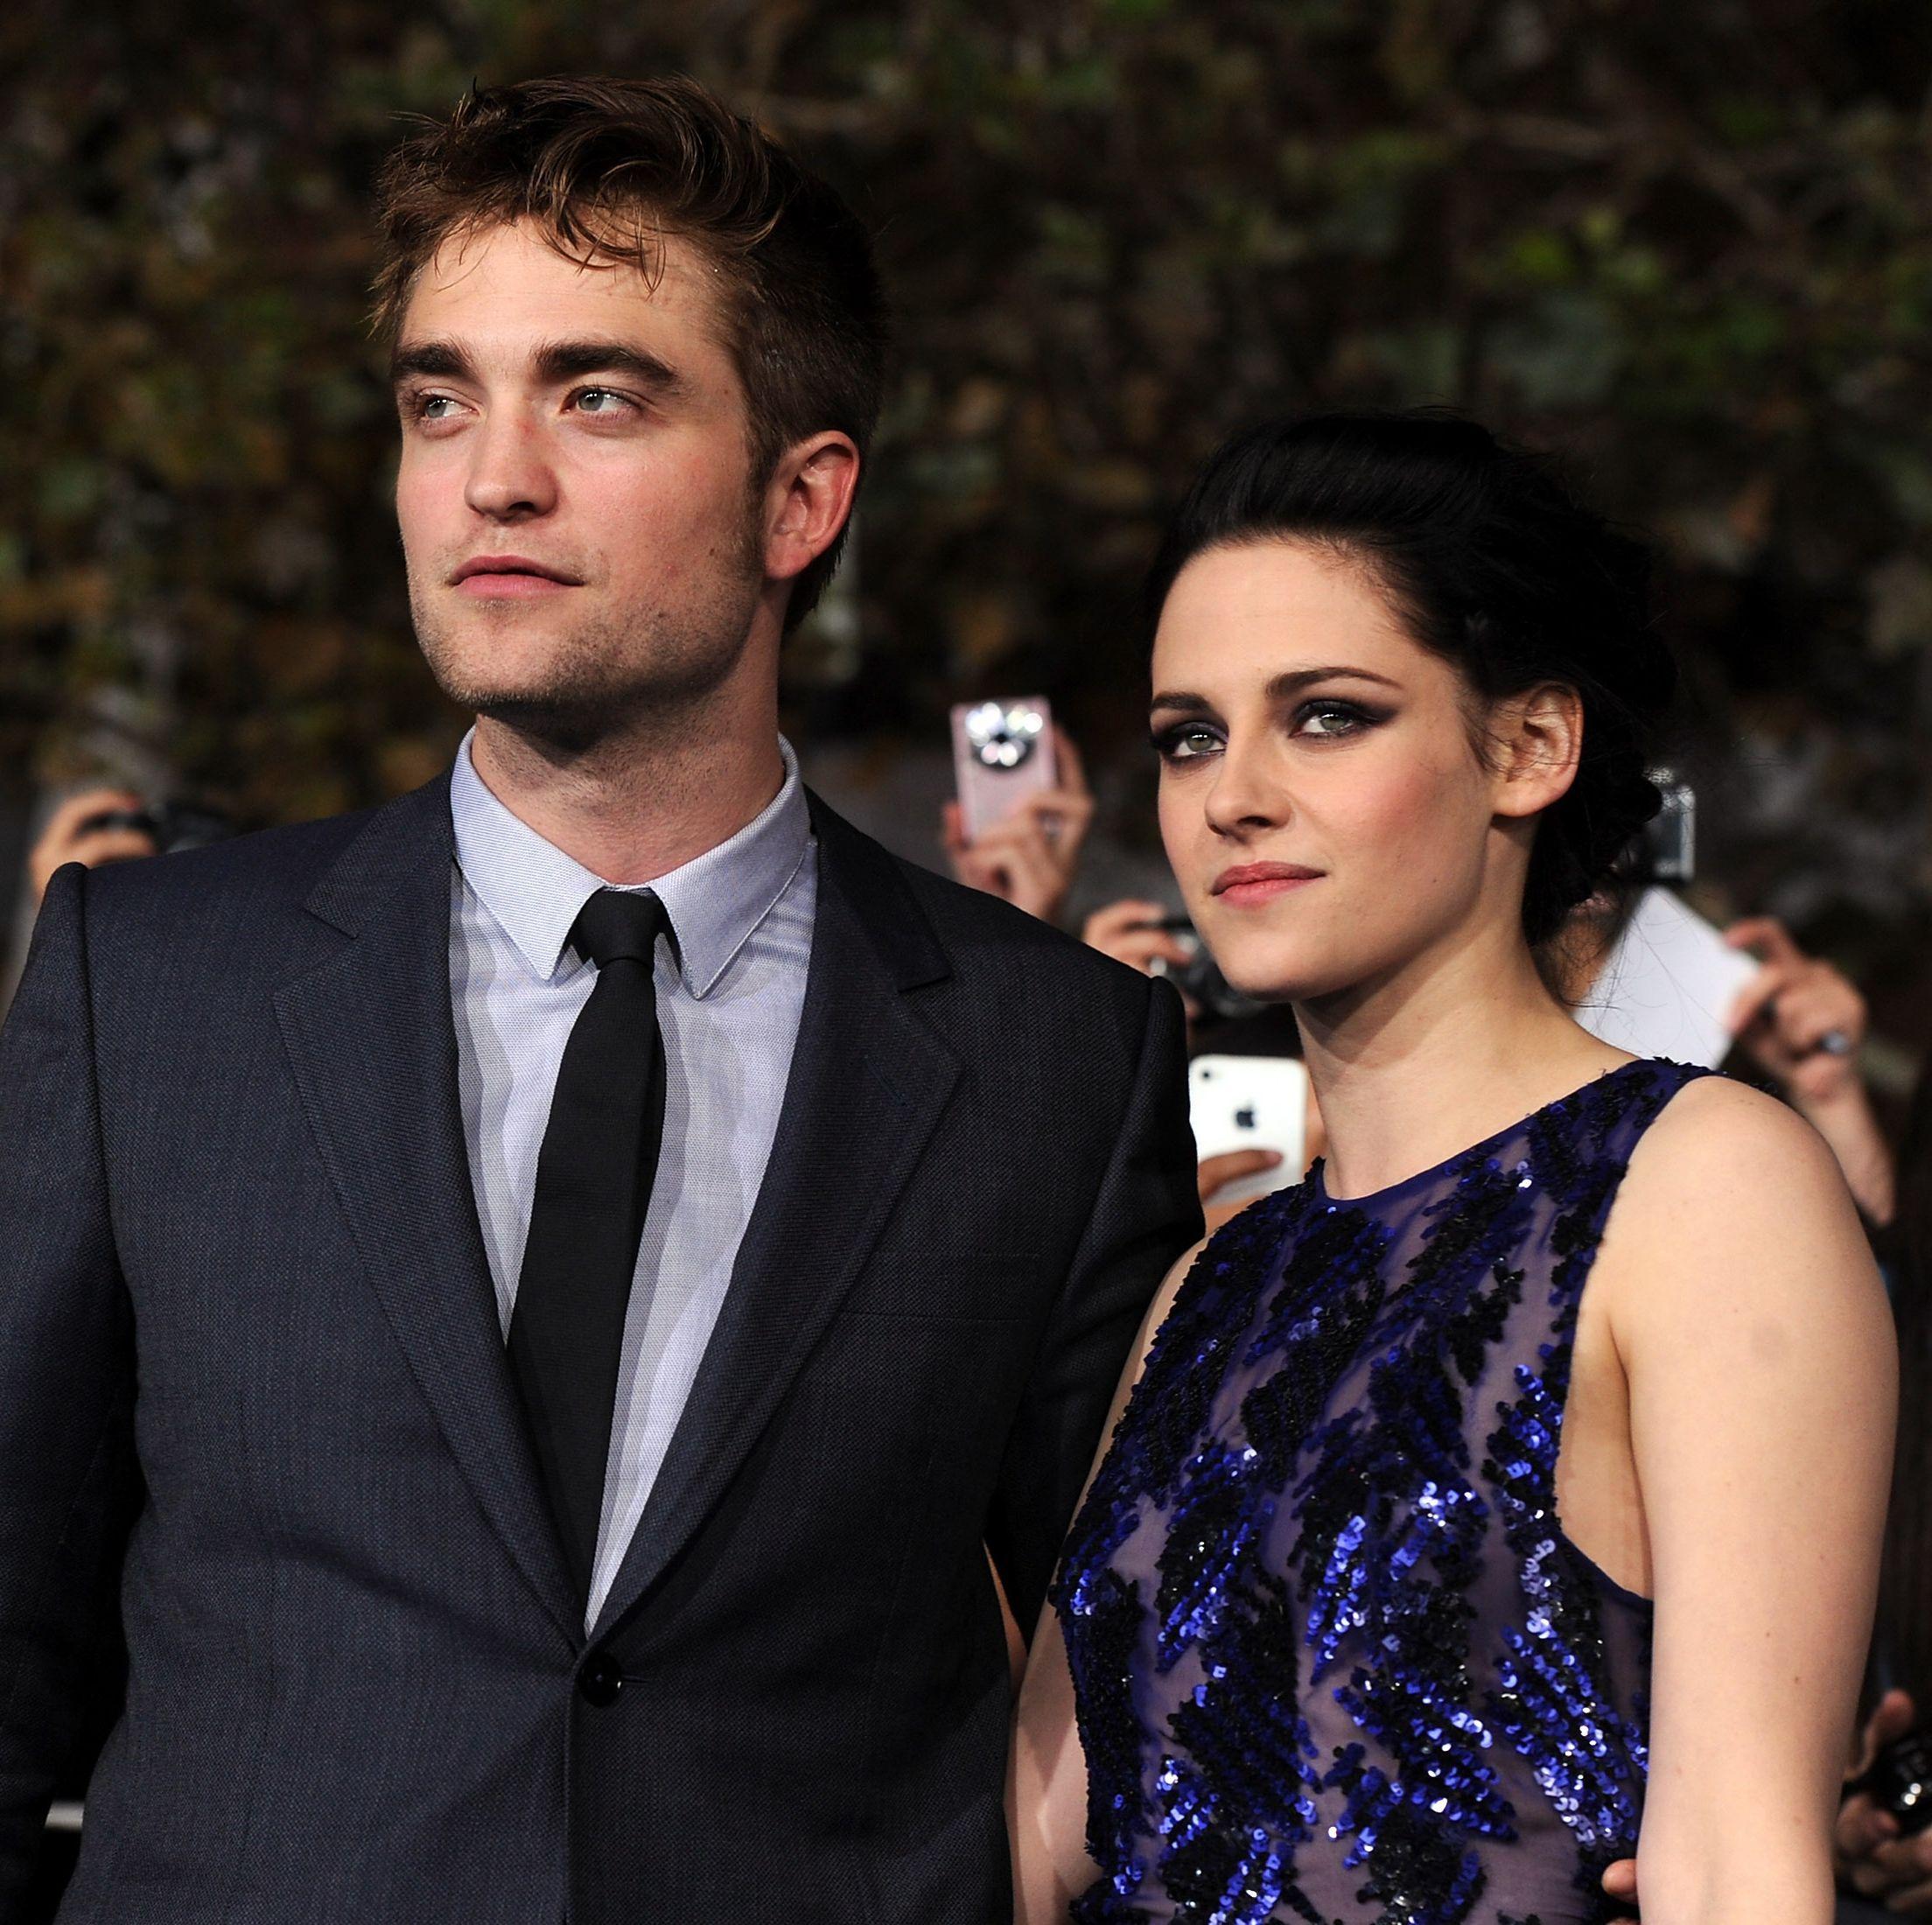 Kristen Stewart Opened Up About Dating Robert Pattinson